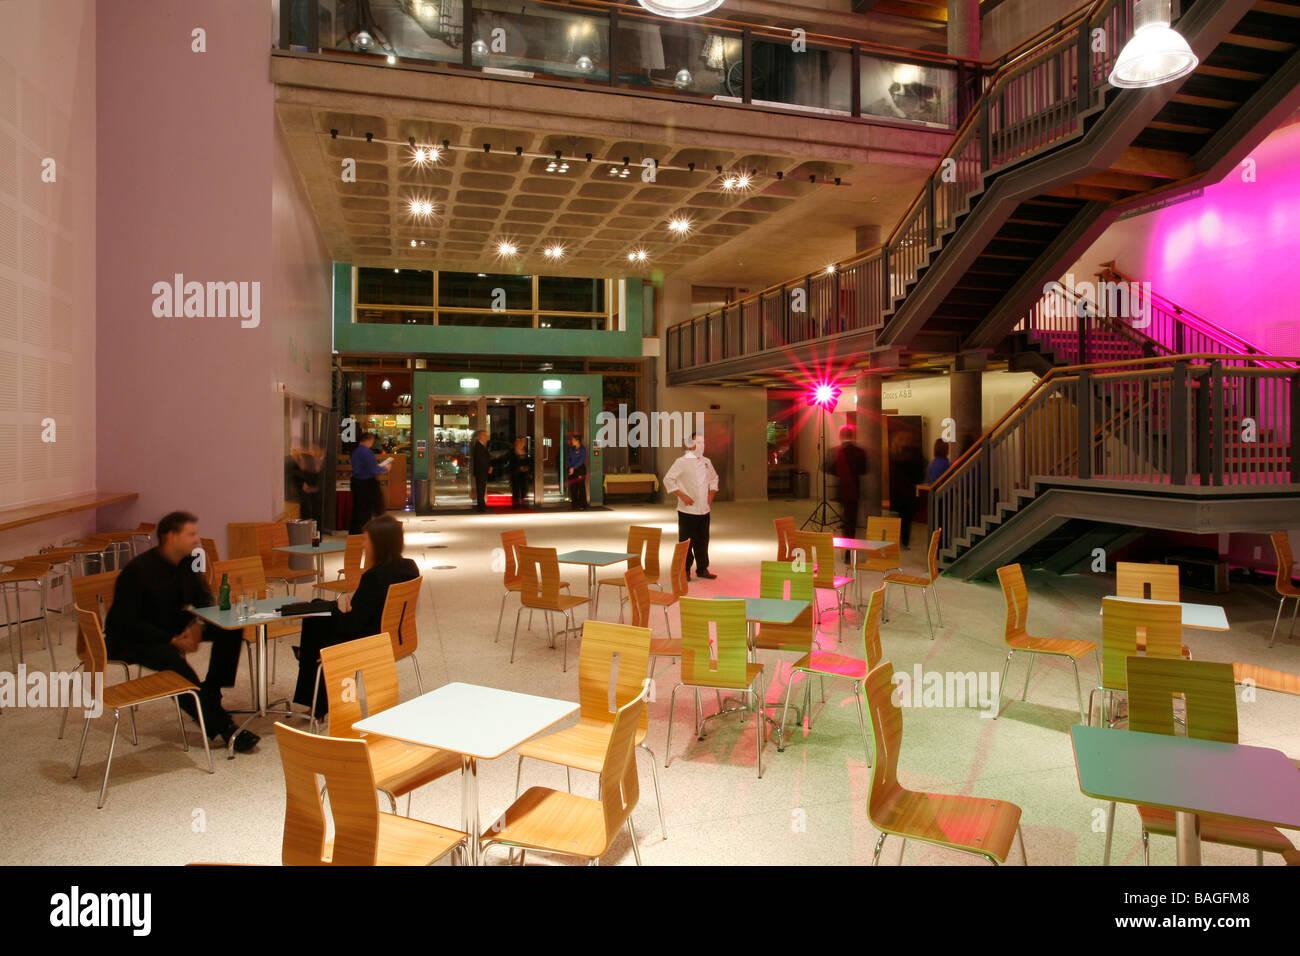 Grand Opera House Extension Belfast United Kingdom Arts Team Rhwl Architects Interior